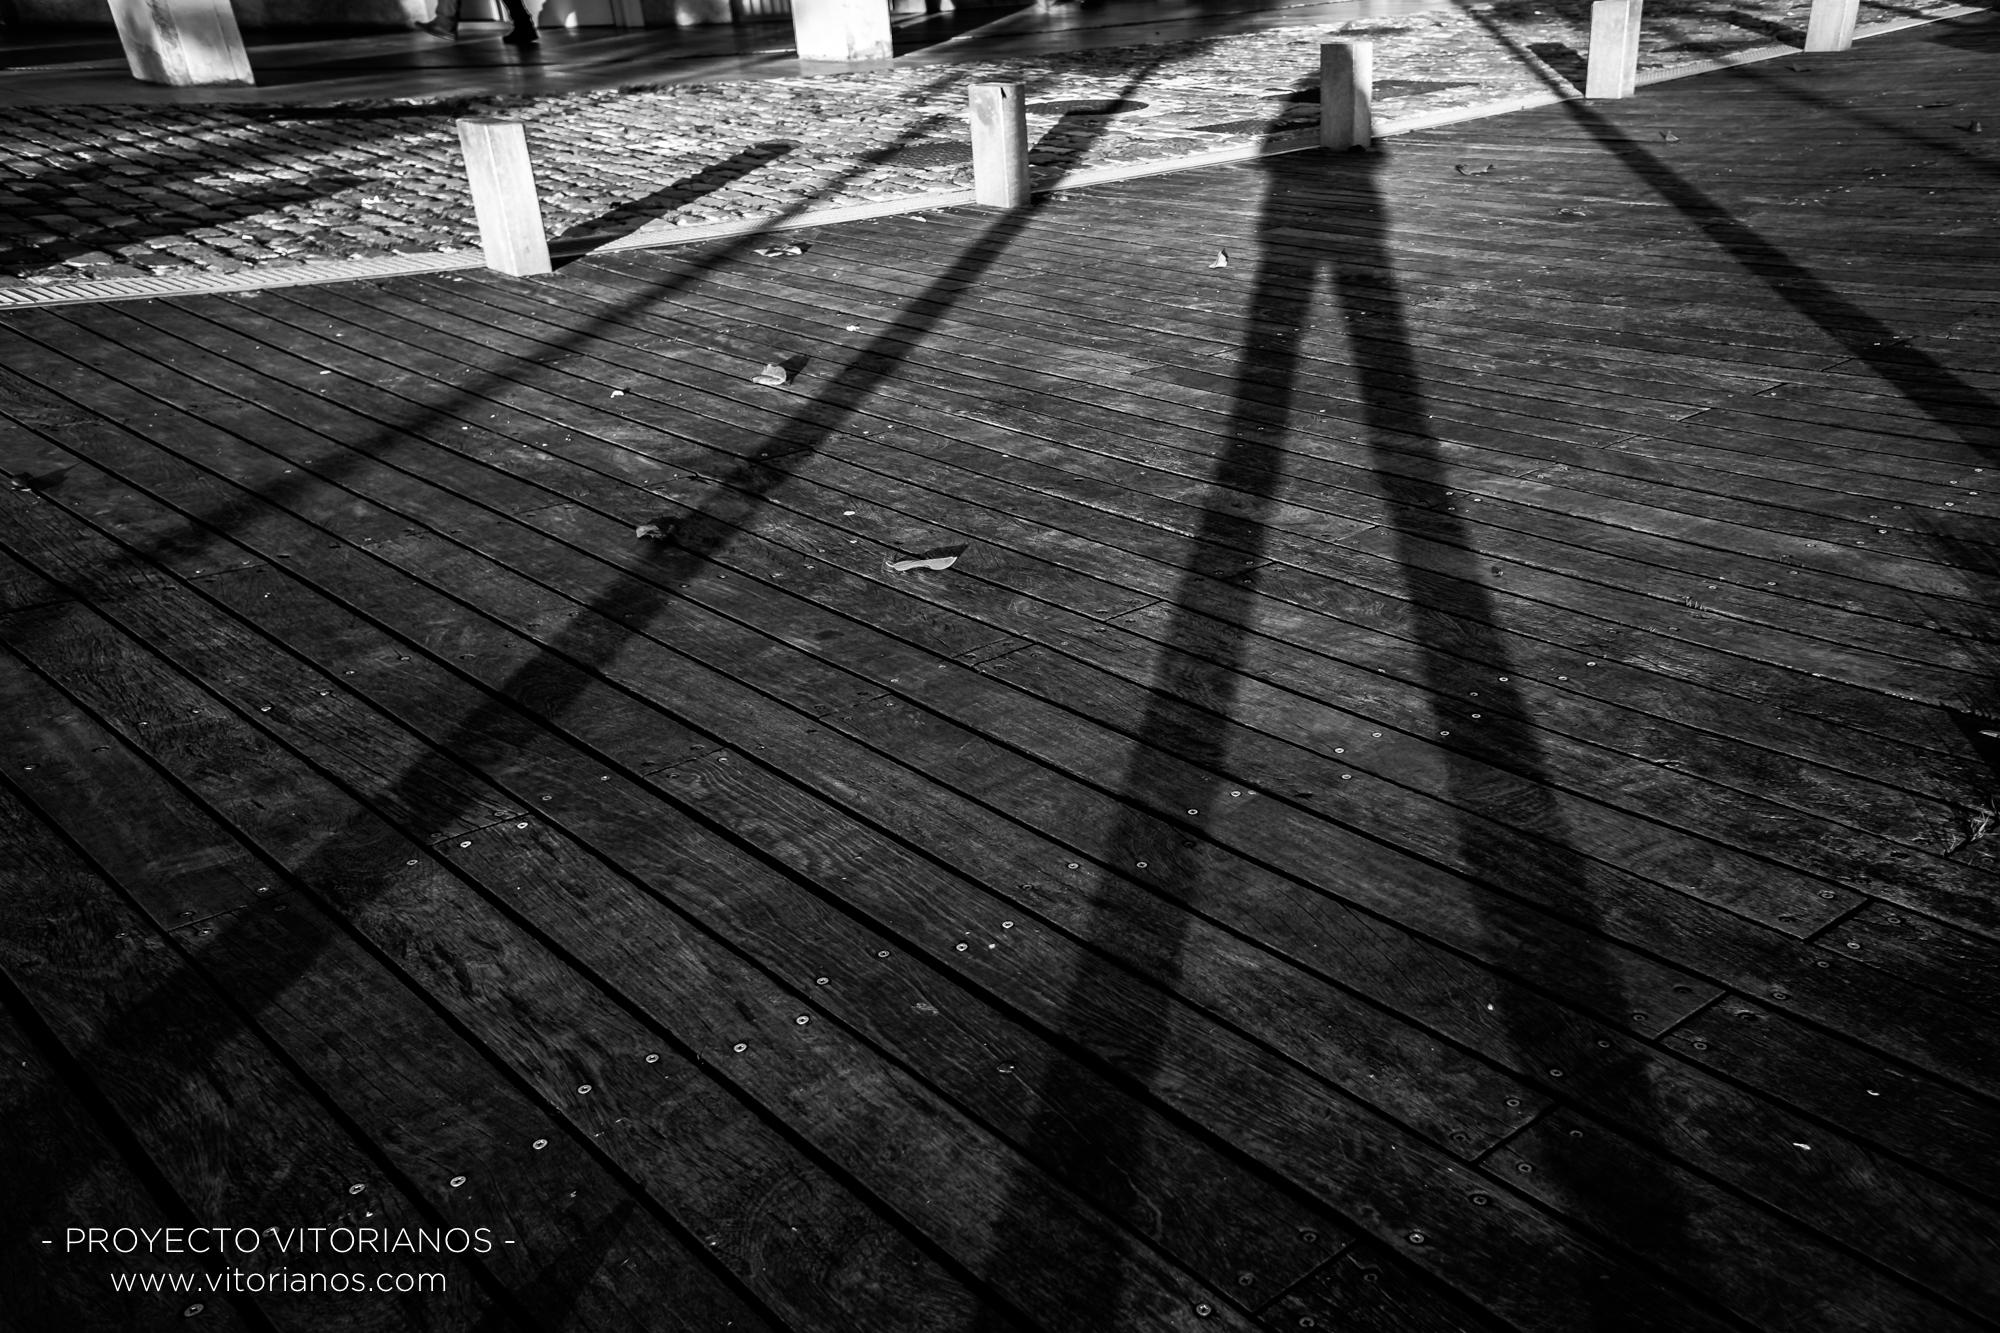 Juego de sombras - Foto: Asun Zárate